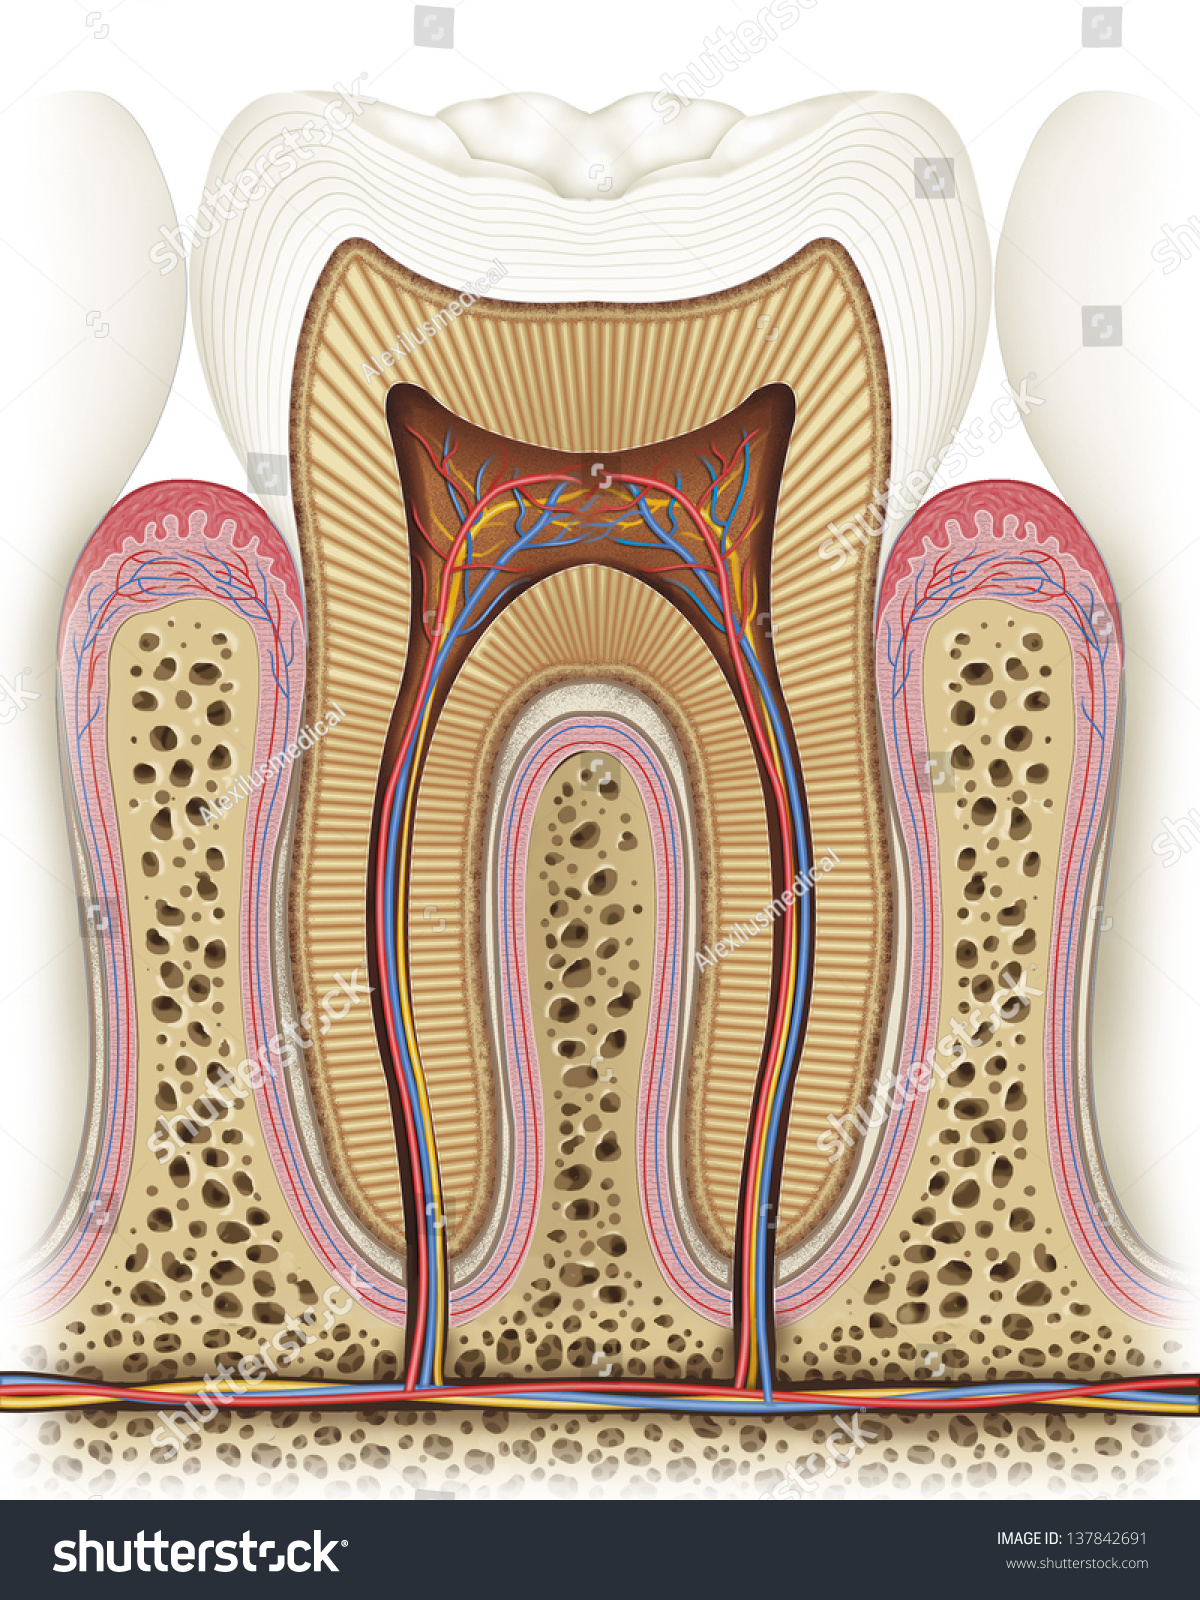 Illustration Anatomy Structure Tooth Stock Illustration 137842691 ...